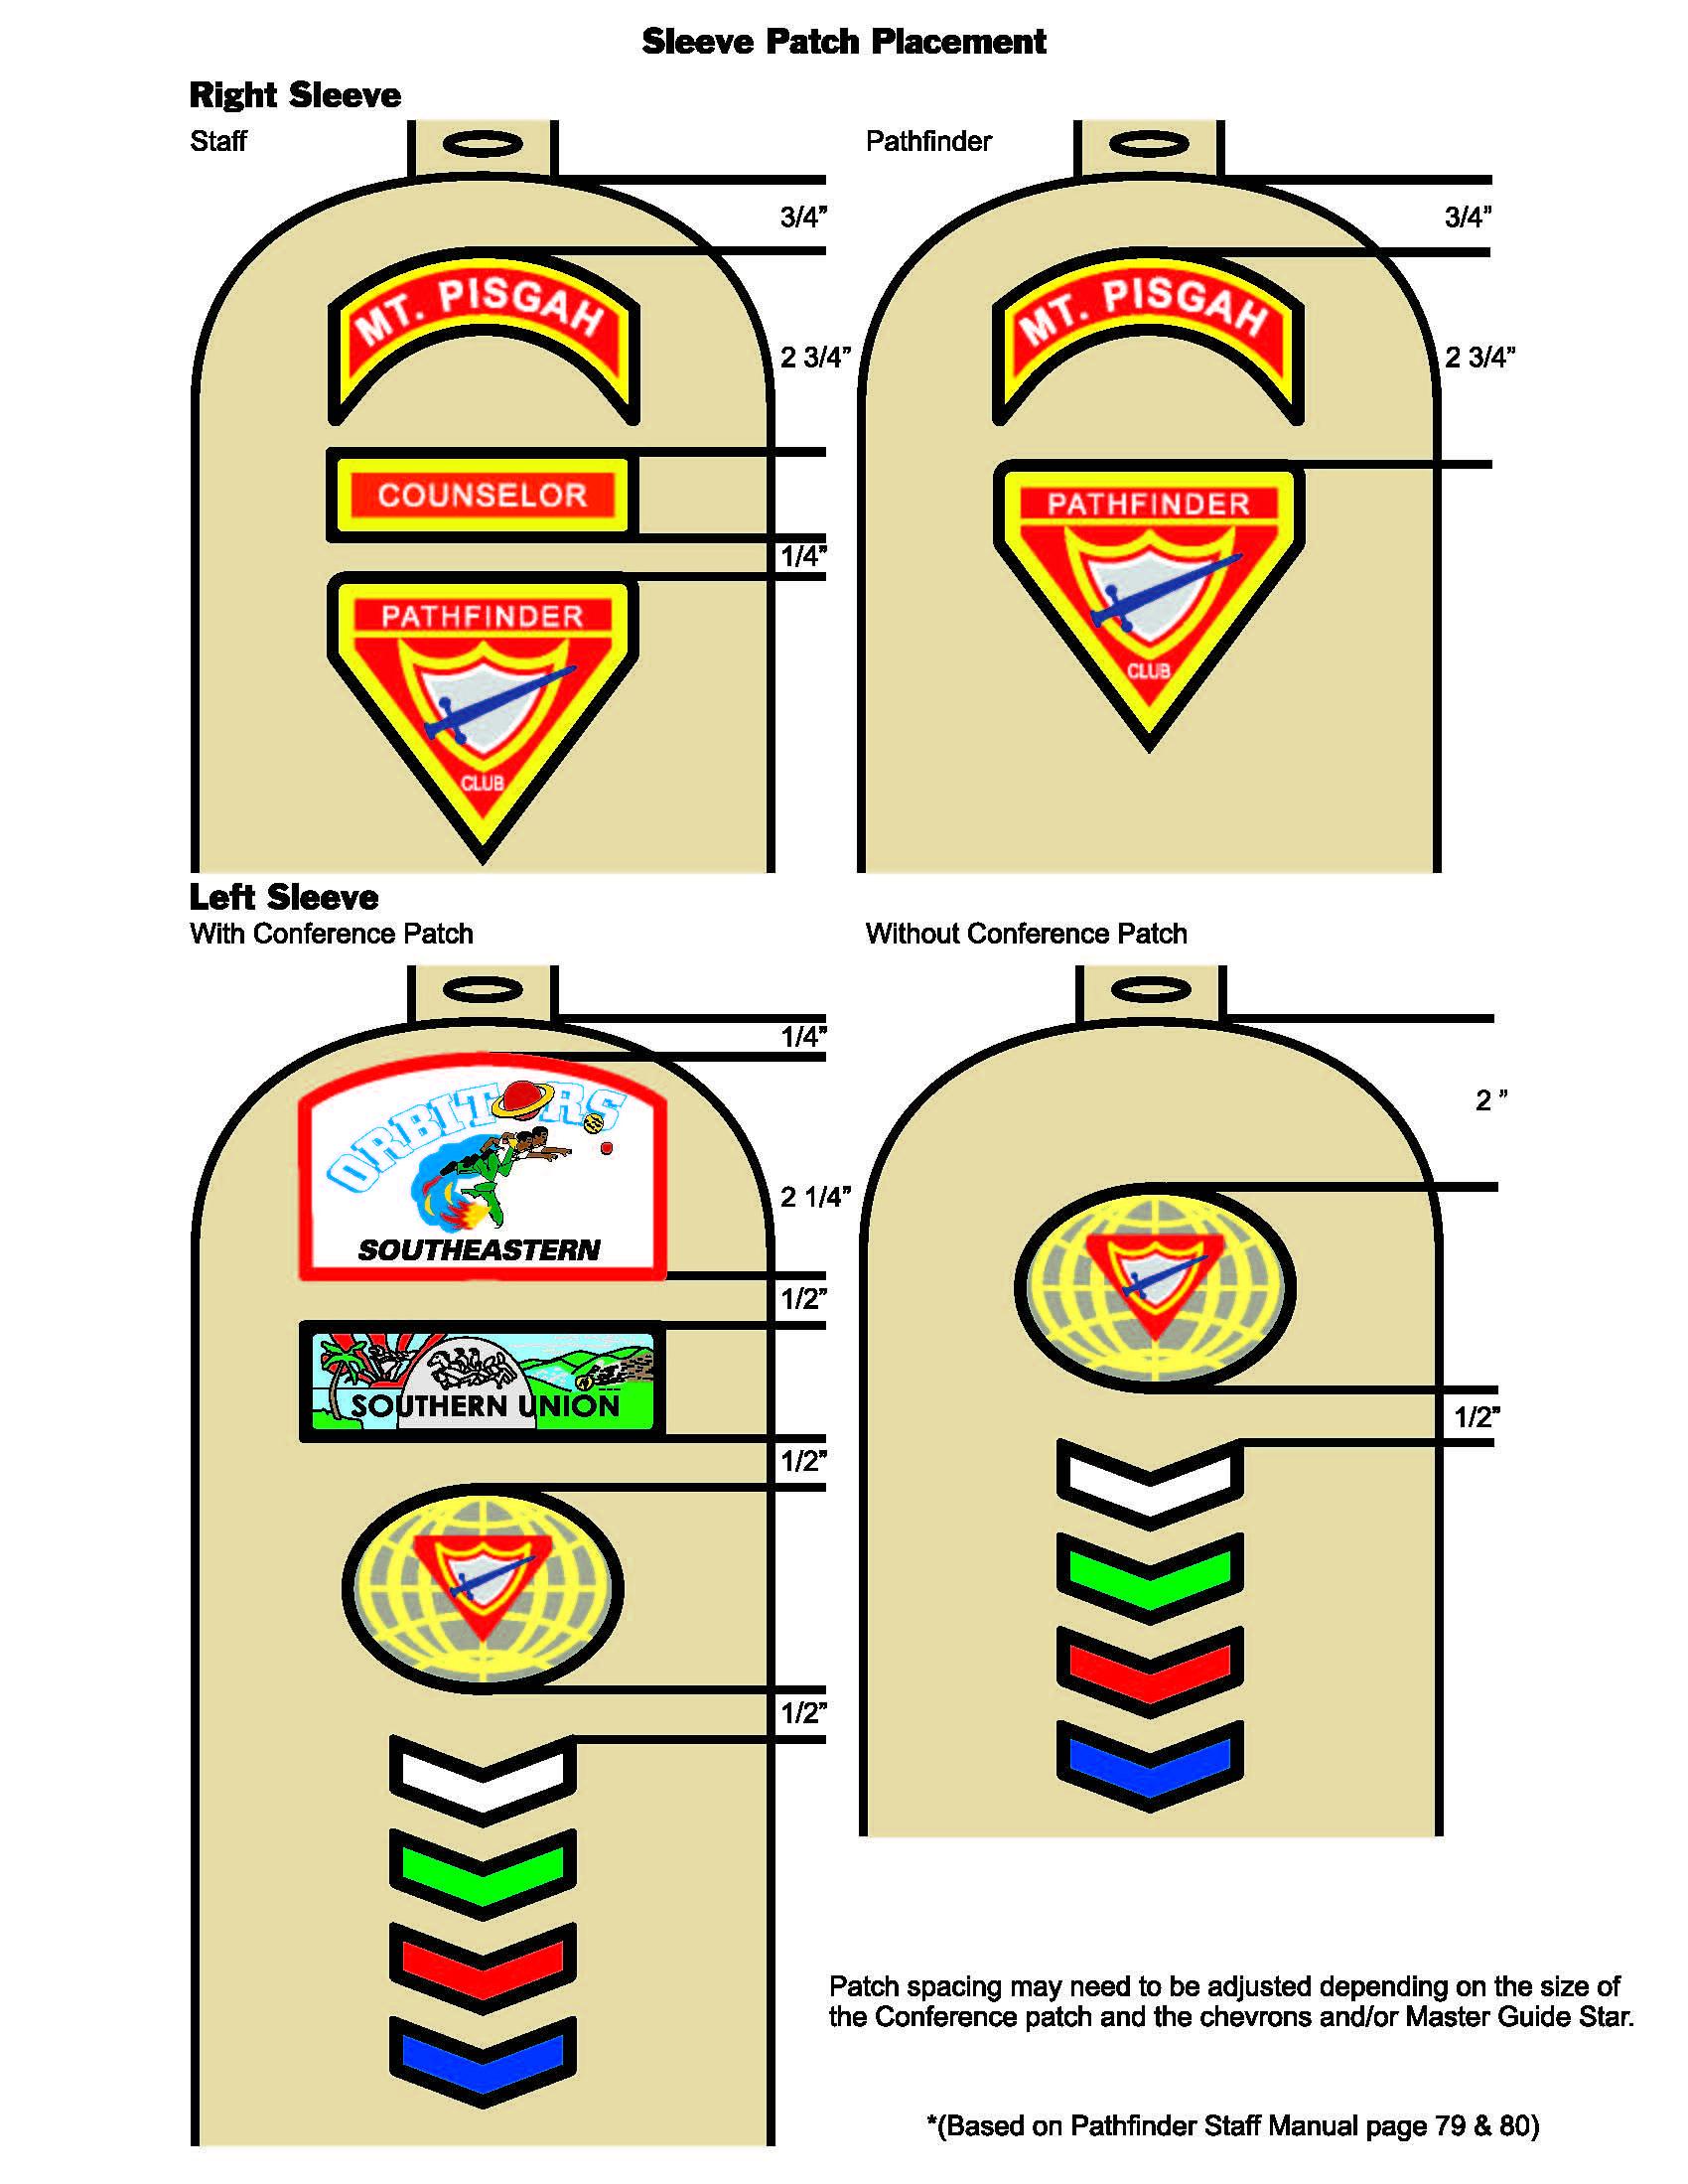 Pathfinder Uniform Patch Placement Sleevejpg 1700 2199 – Pathfinder Honors Worksheets